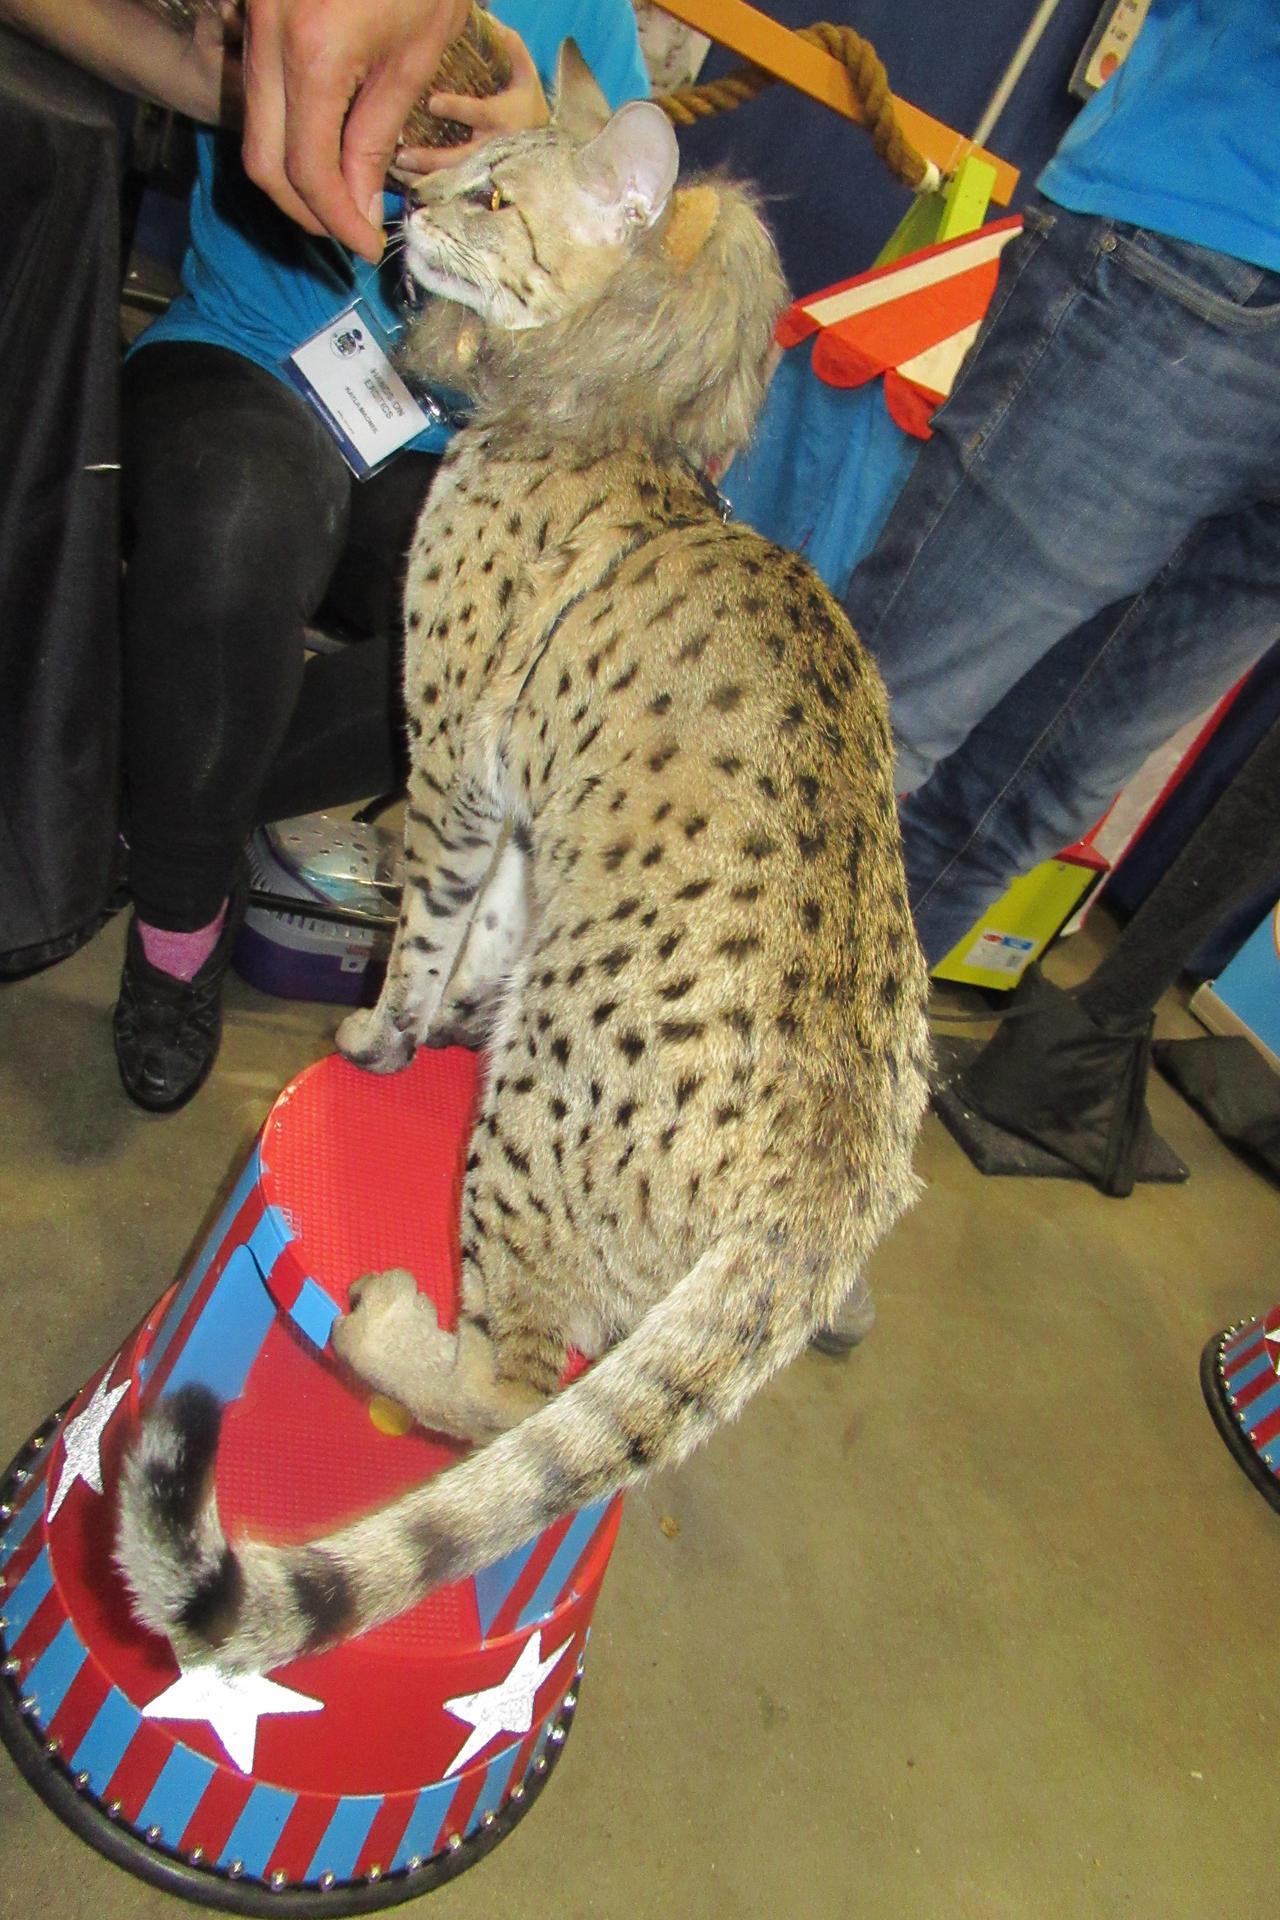 Savannah Cat (Video Link) by Codetski101 on DeviantArt